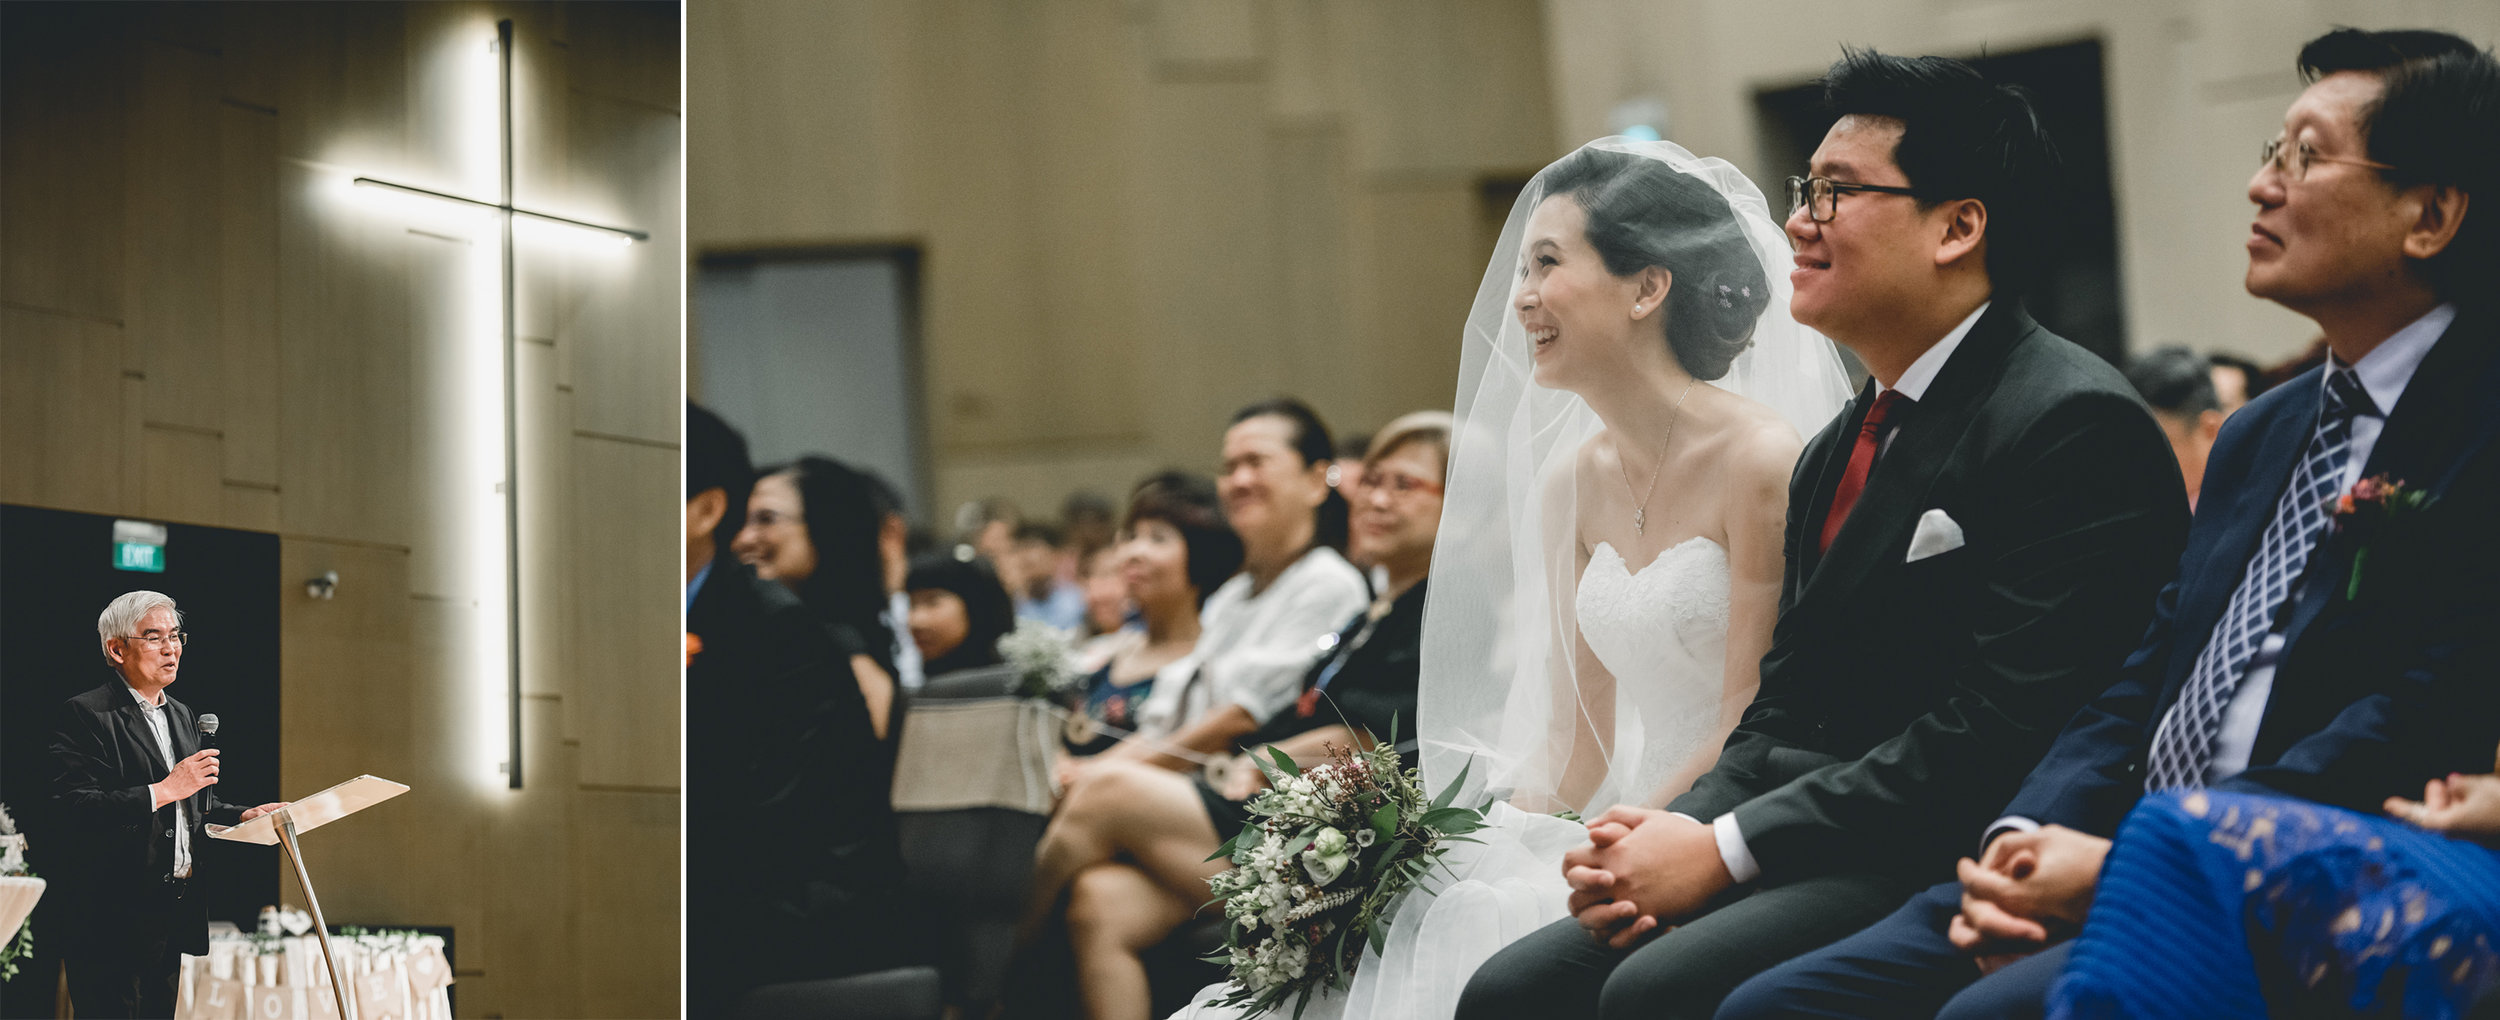 Church Wedding Bethel 00096.JPG